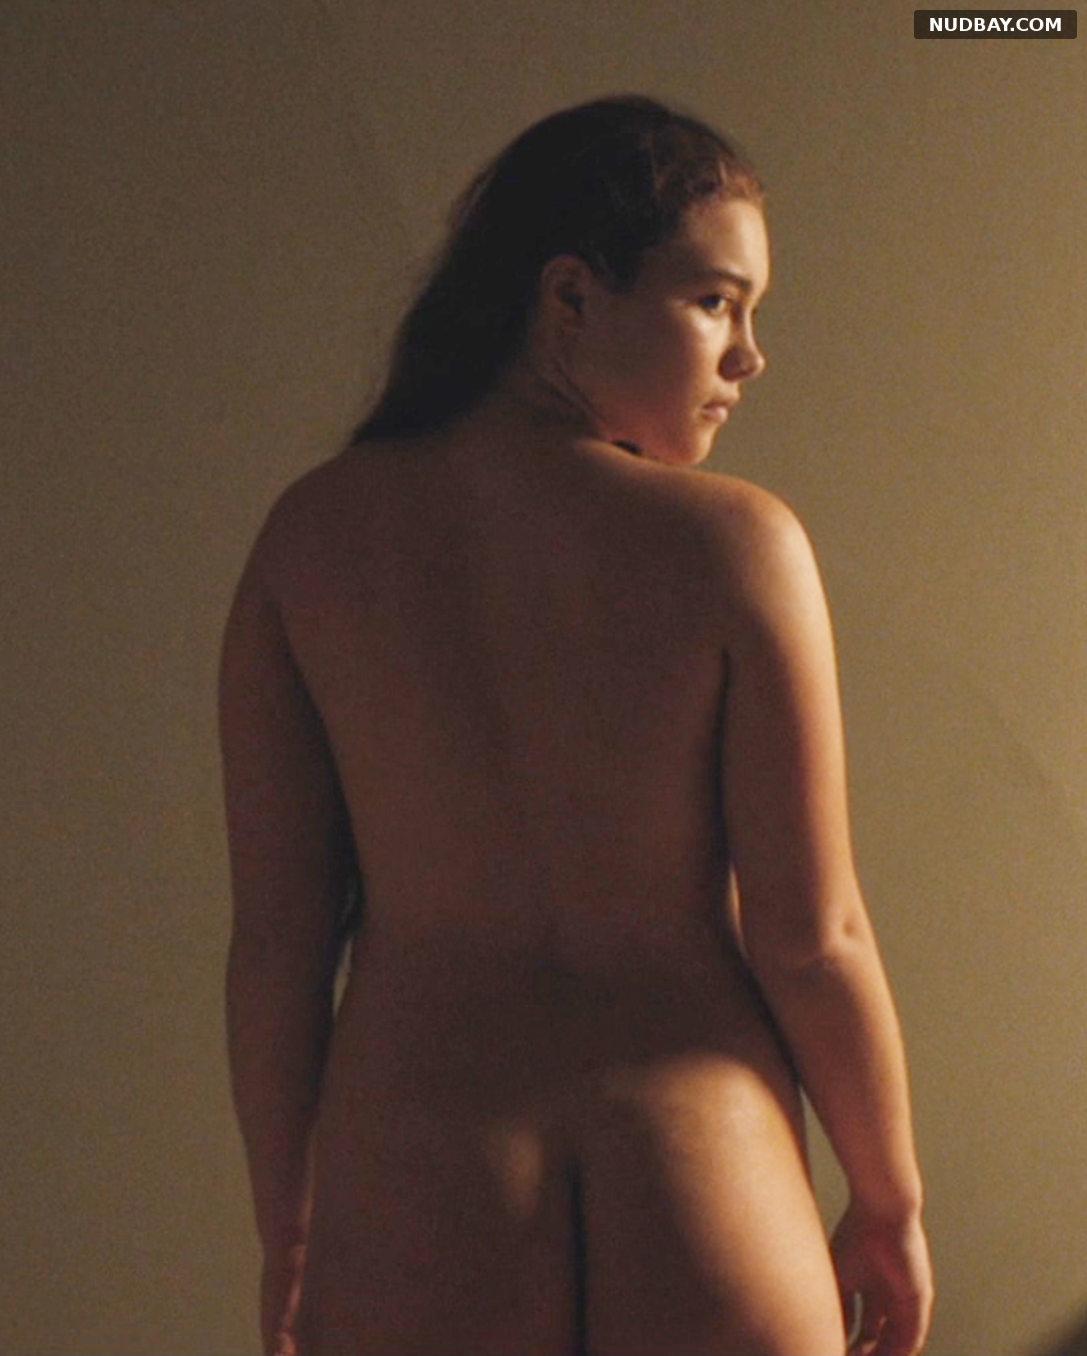 Florence Pugh Yelena Belova nude ass Lady Macbeth (2016)